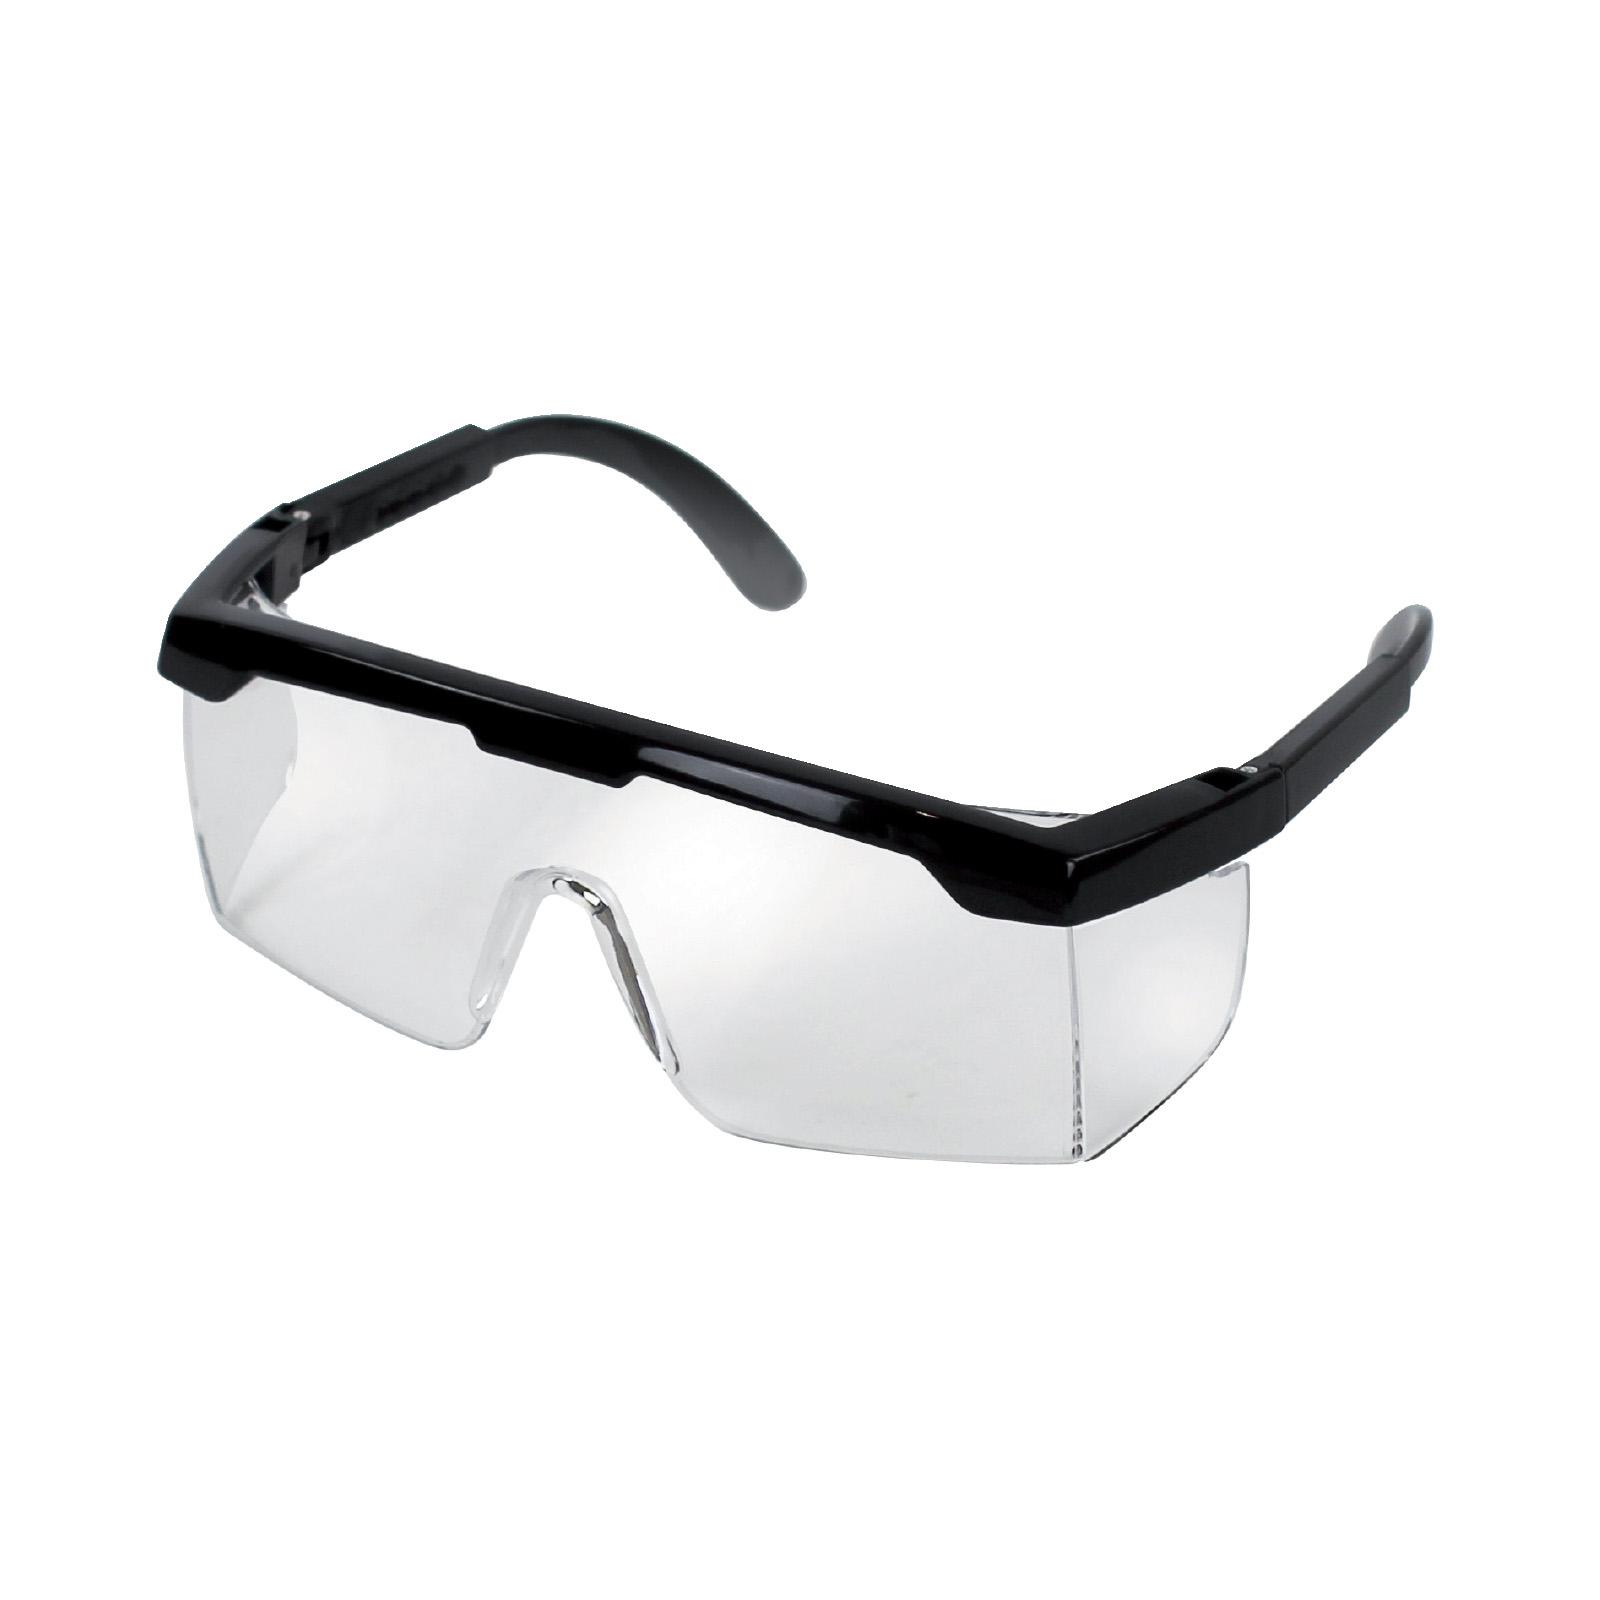 UNI-PRO Safety Glasses